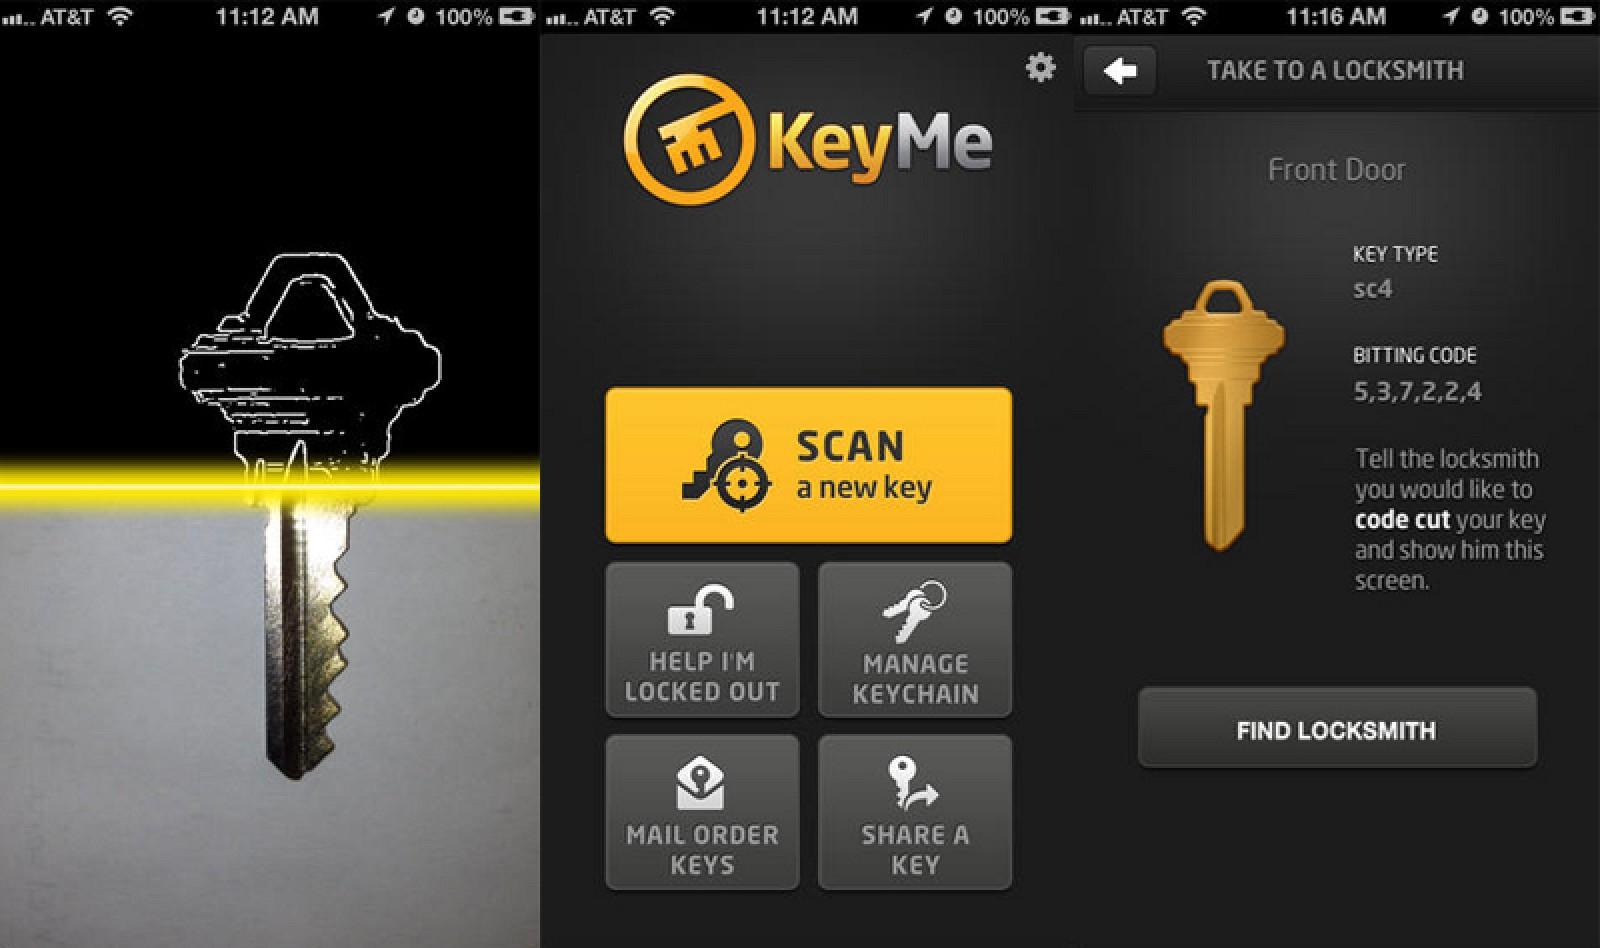 ios lost private key